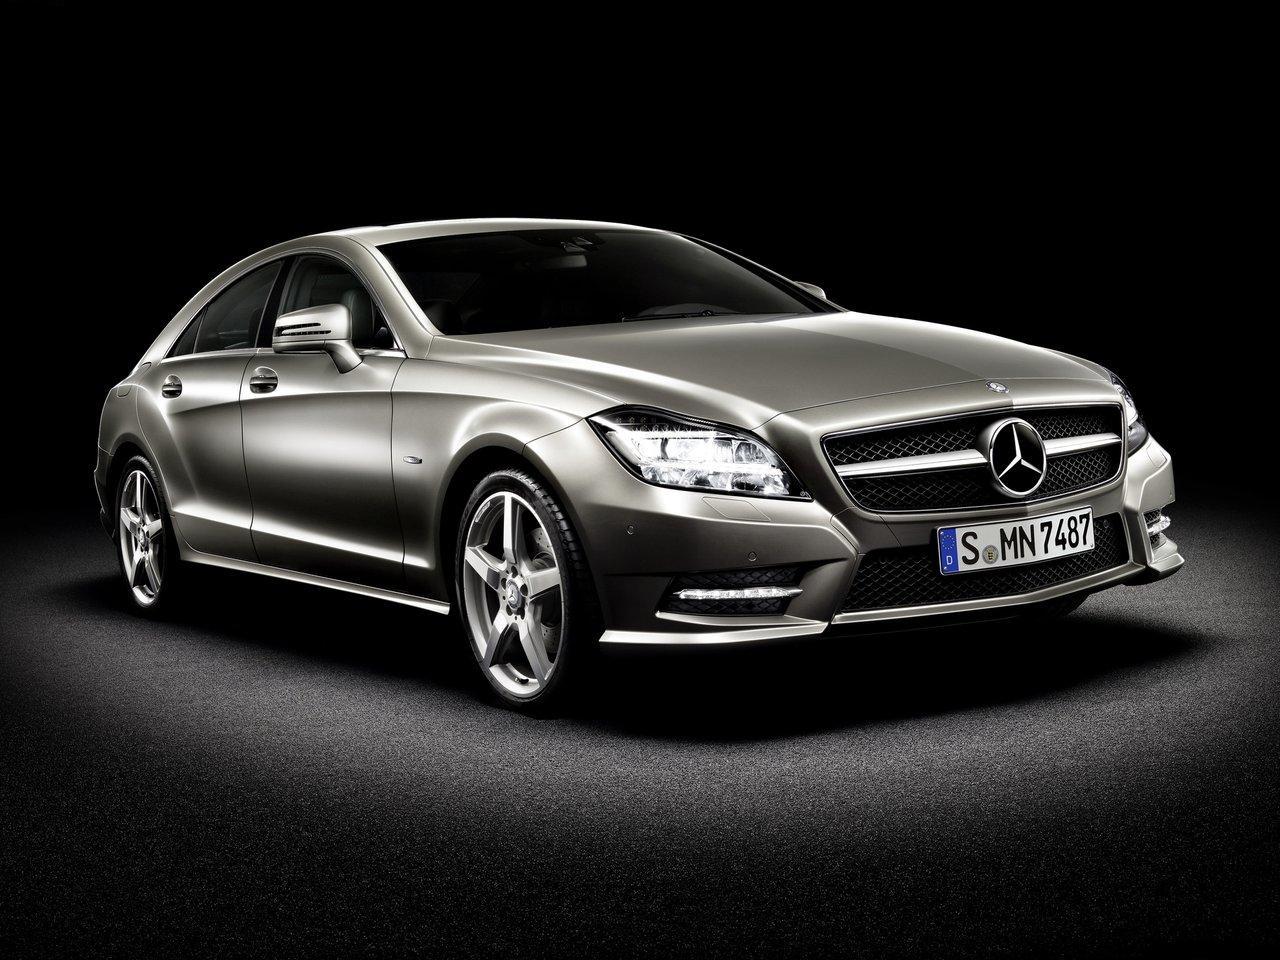 http://2.bp.blogspot.com/_3V1YR3u6VBg/THQeeIiclyI/AAAAAAAAFN0/ZA1n61B2yqc/s1600/Mercedes-Benz-CLS-Class_2012_1280x960_wallpaper_02.jpg